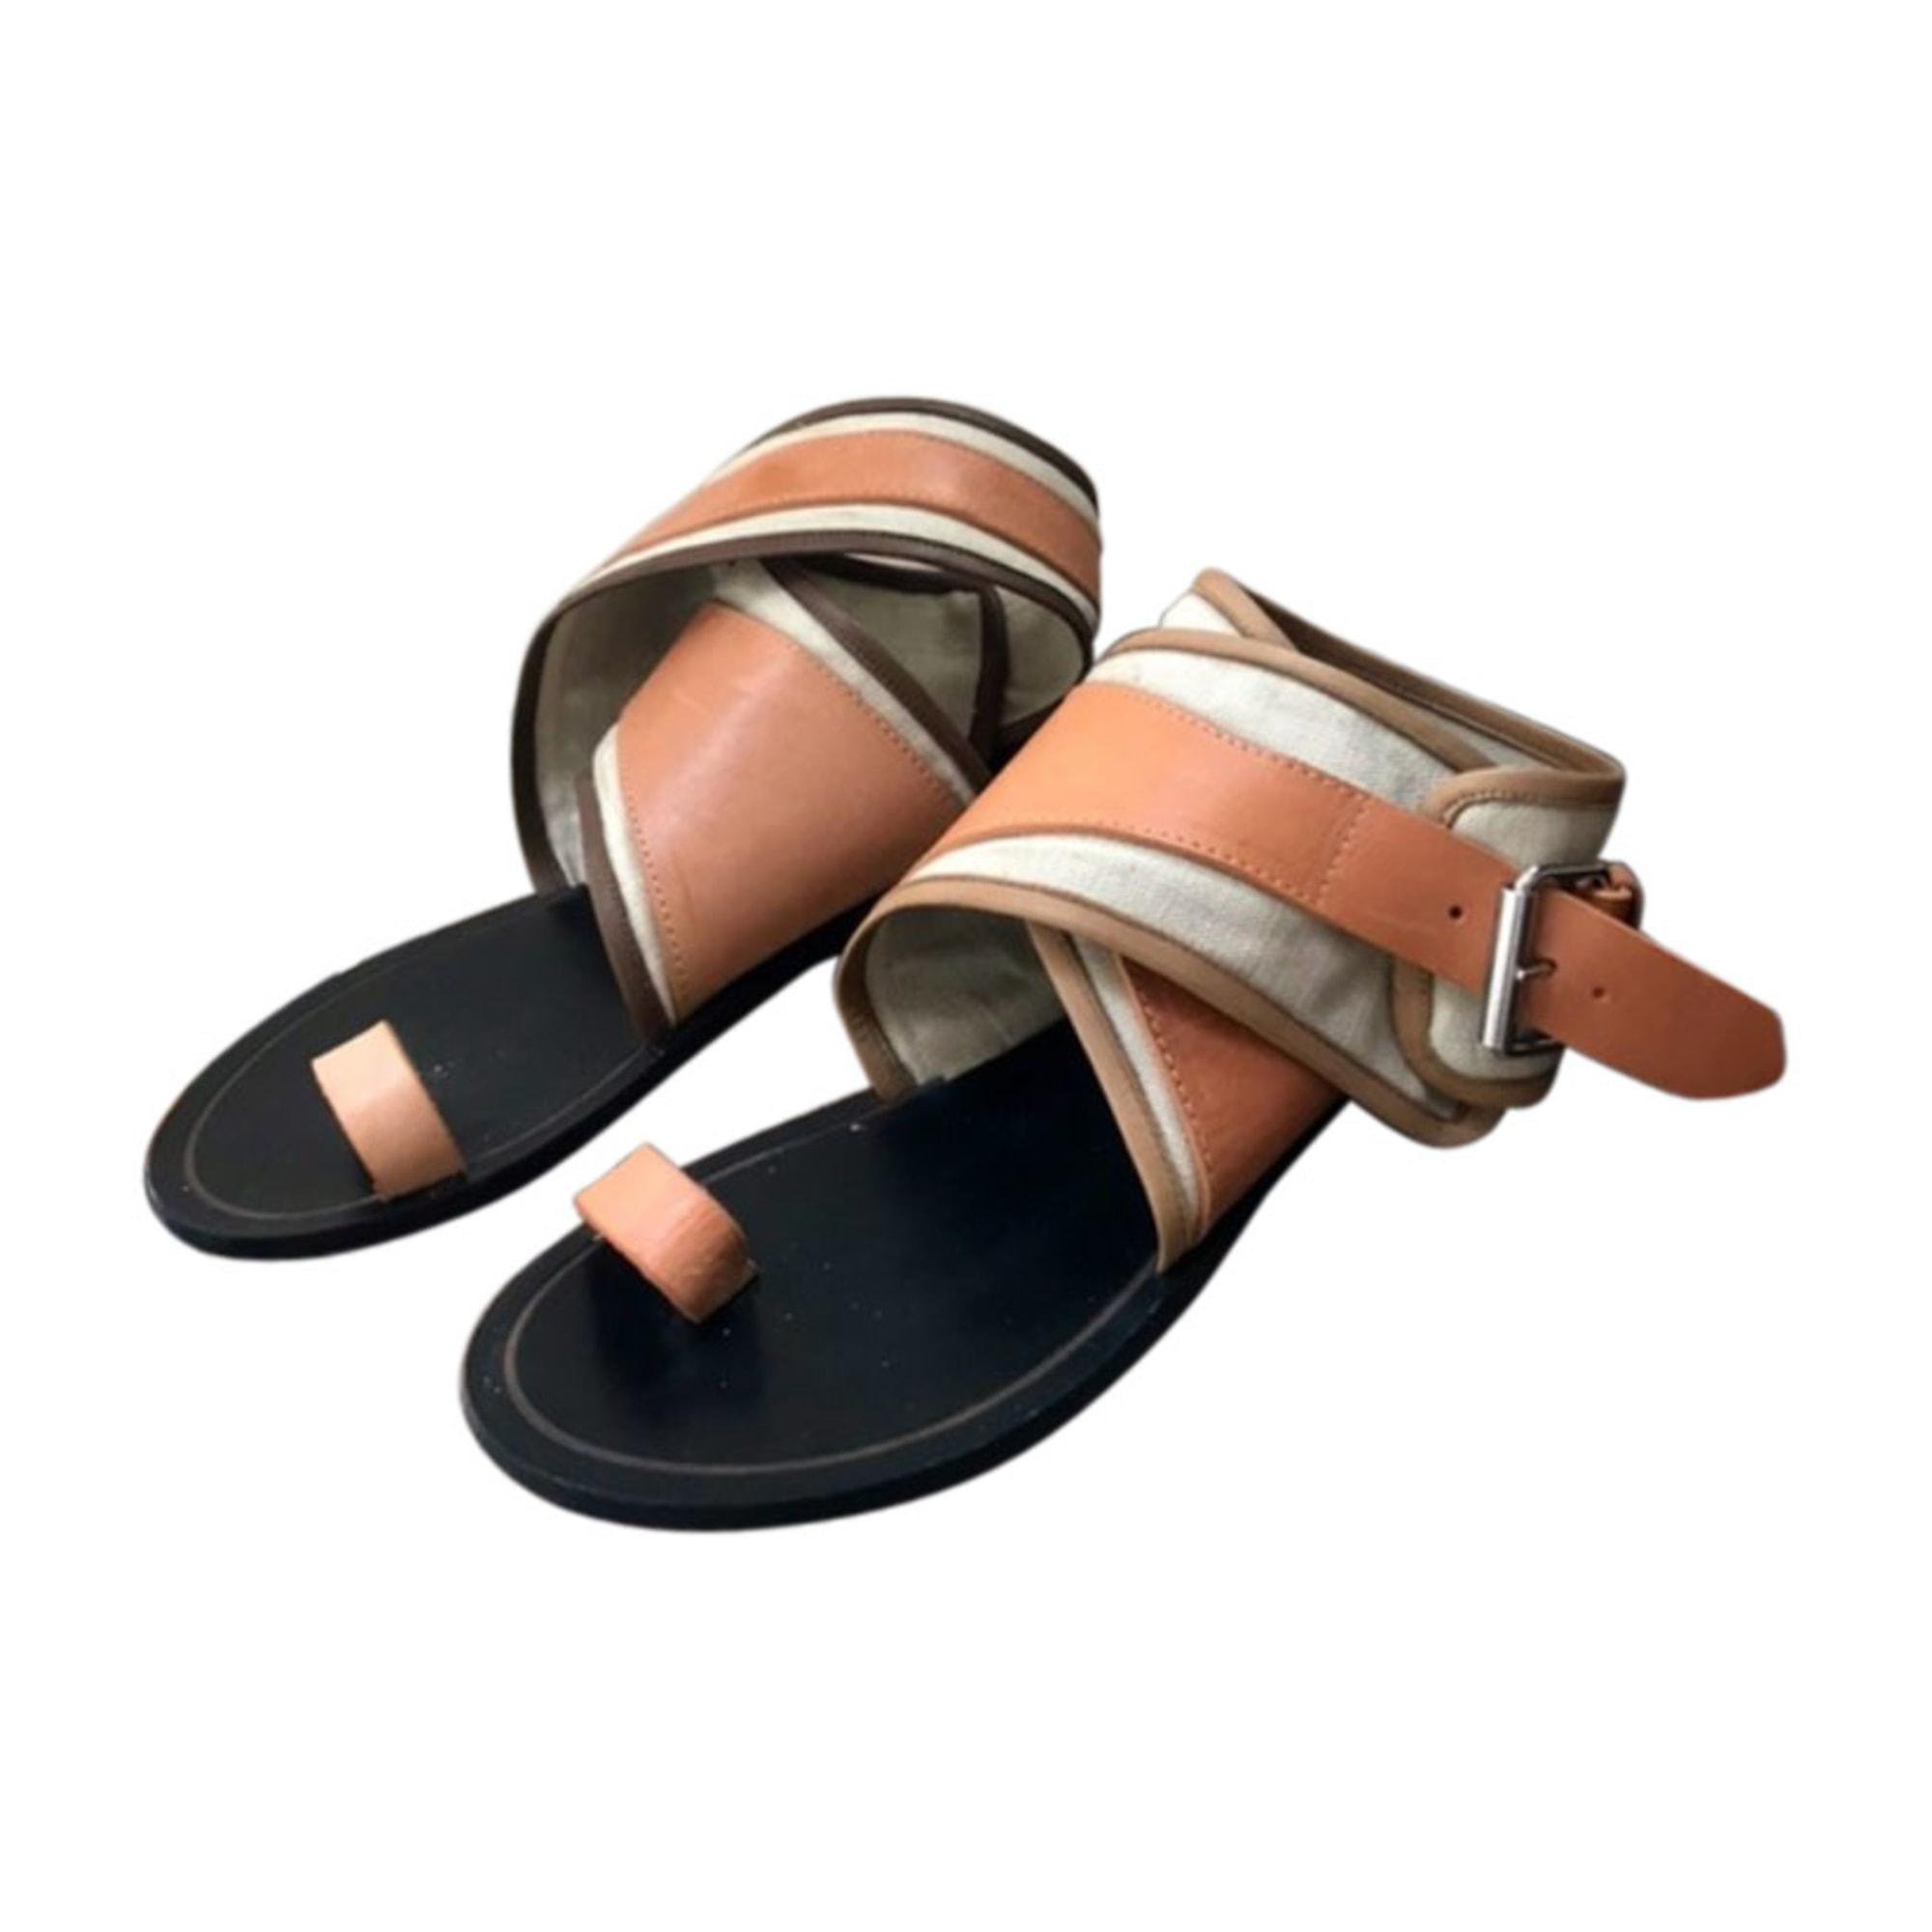 Flat Sandals ISABEL MARANT Willow Beige, camel